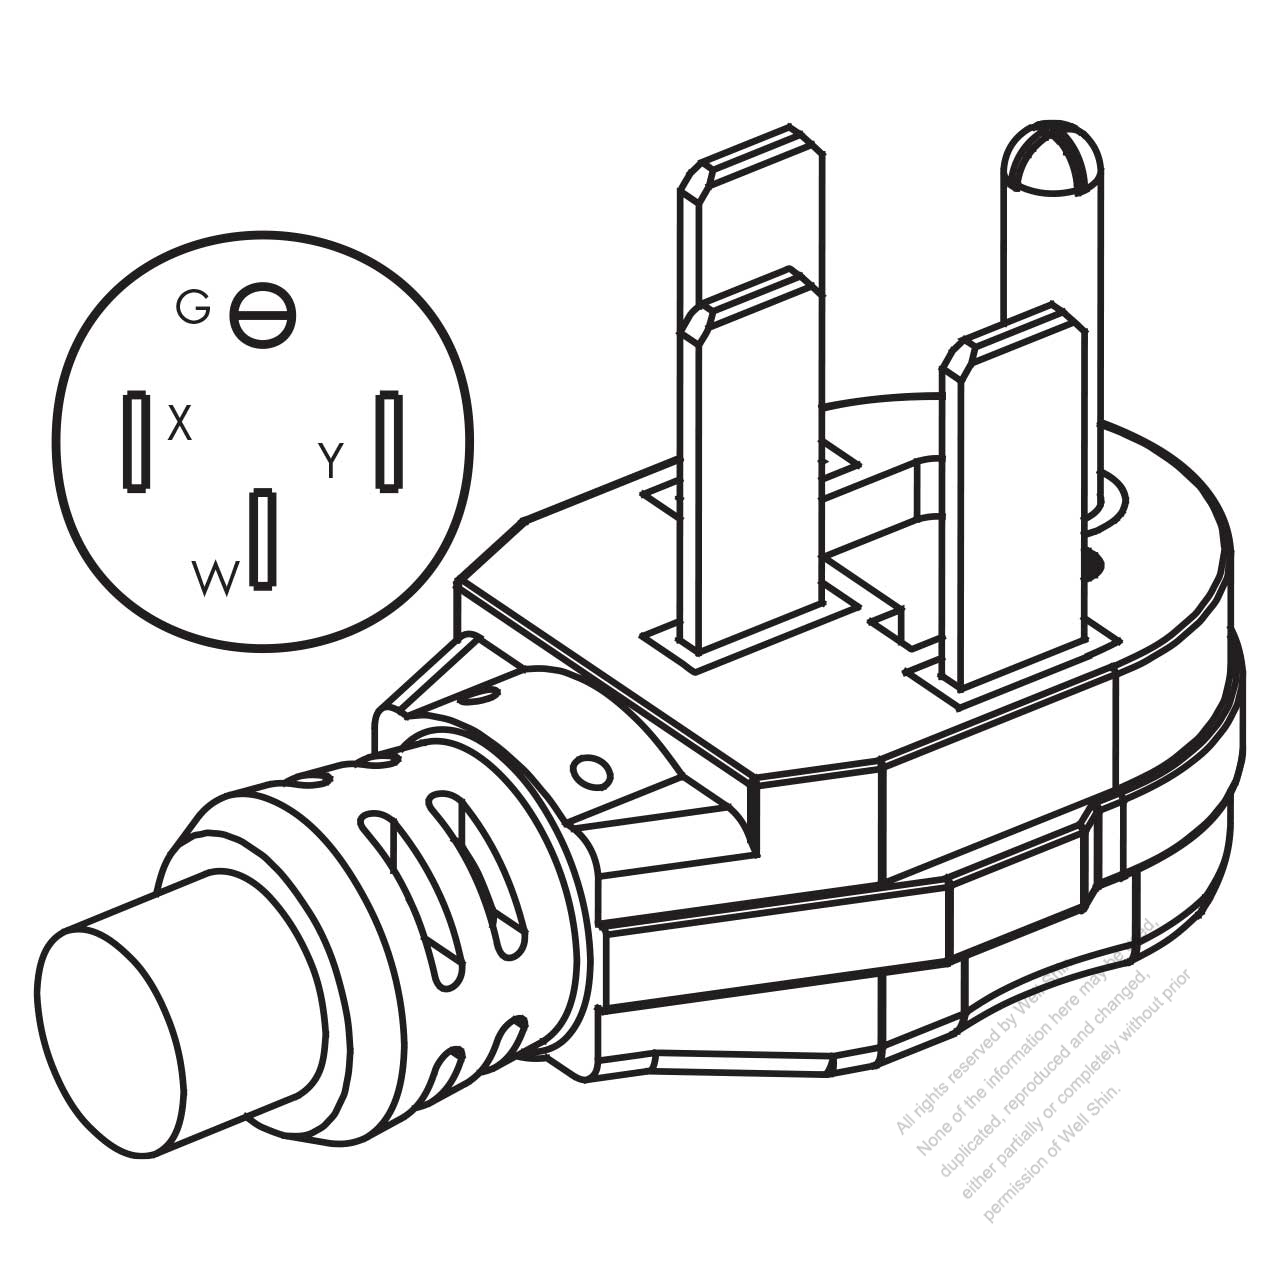 Rv inverter wiring diagram manual